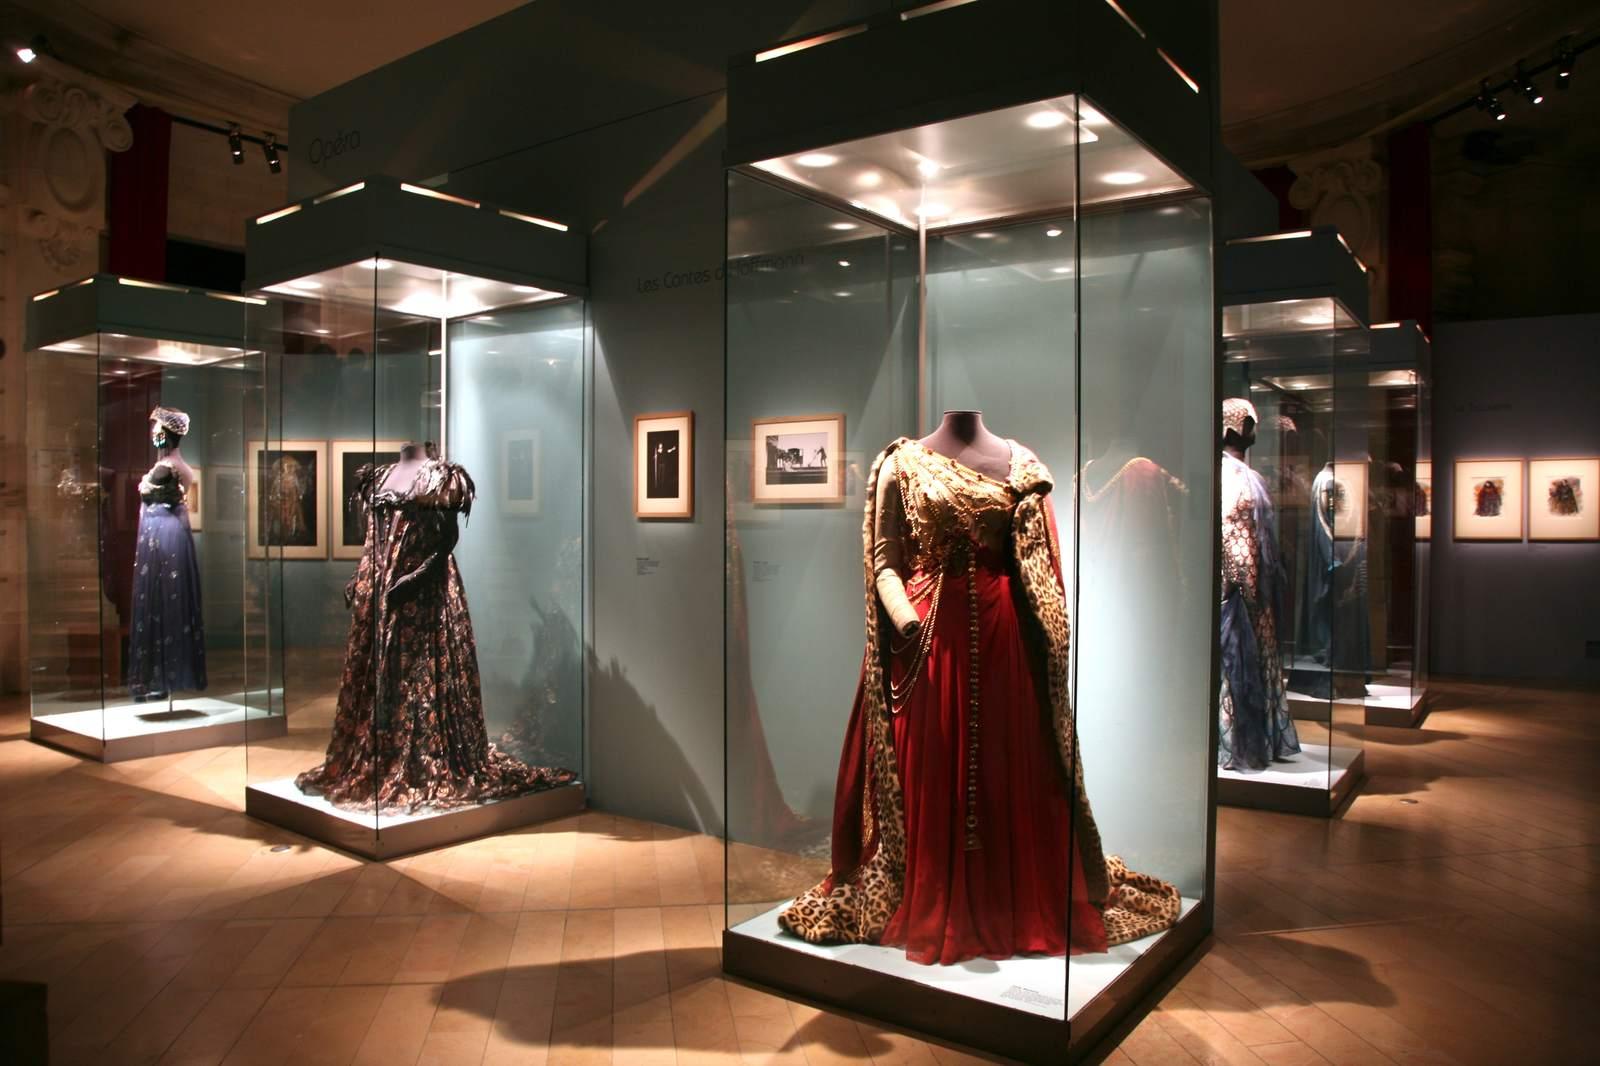 opera library museum8 The Paris Opera Library Museum